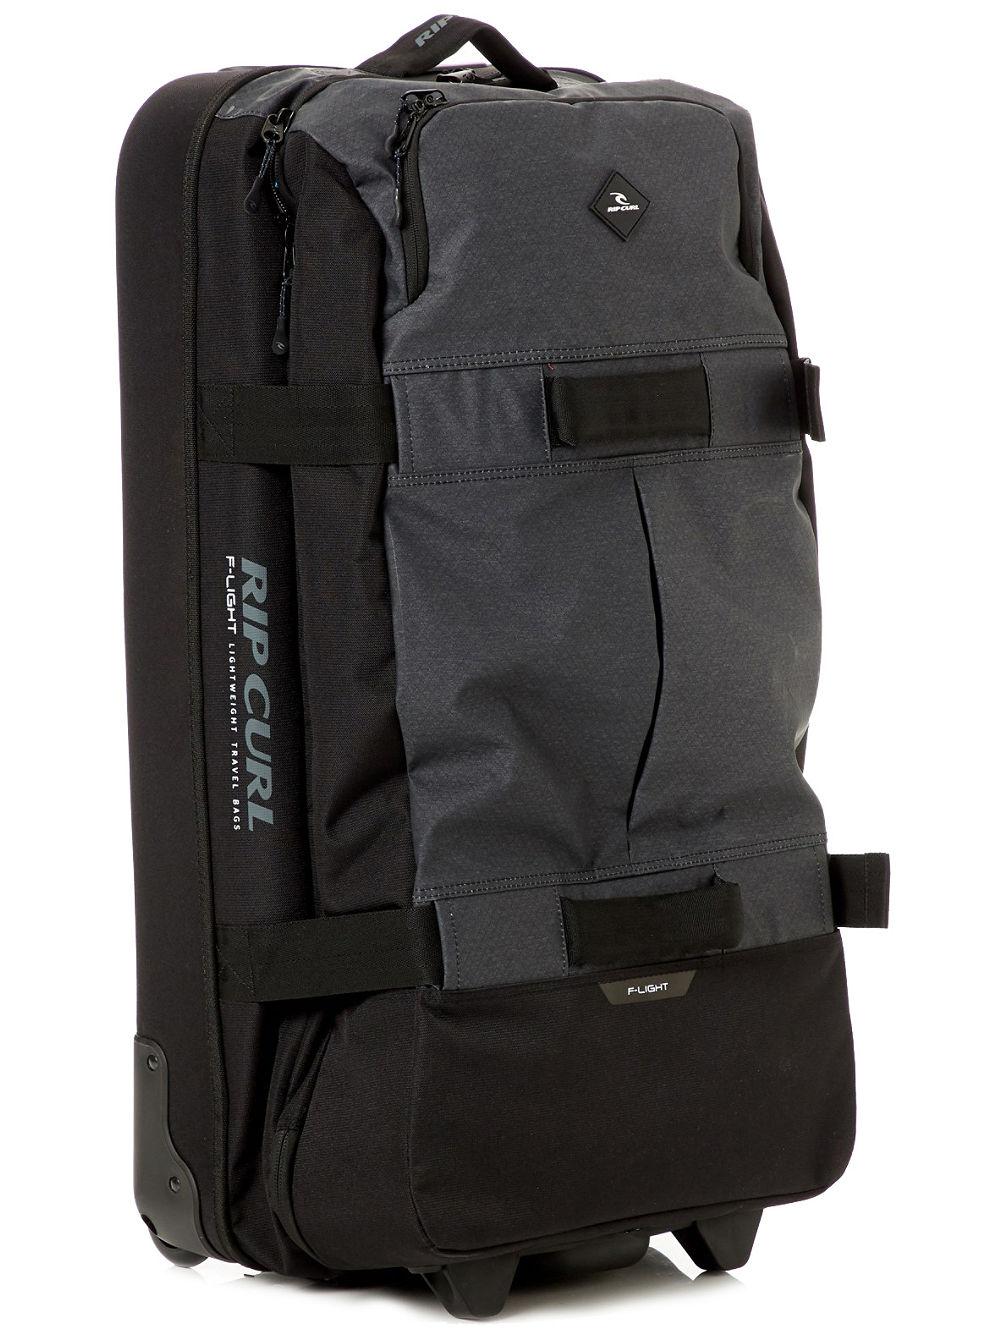 F Light 2 0 Global Midn Travel Bag